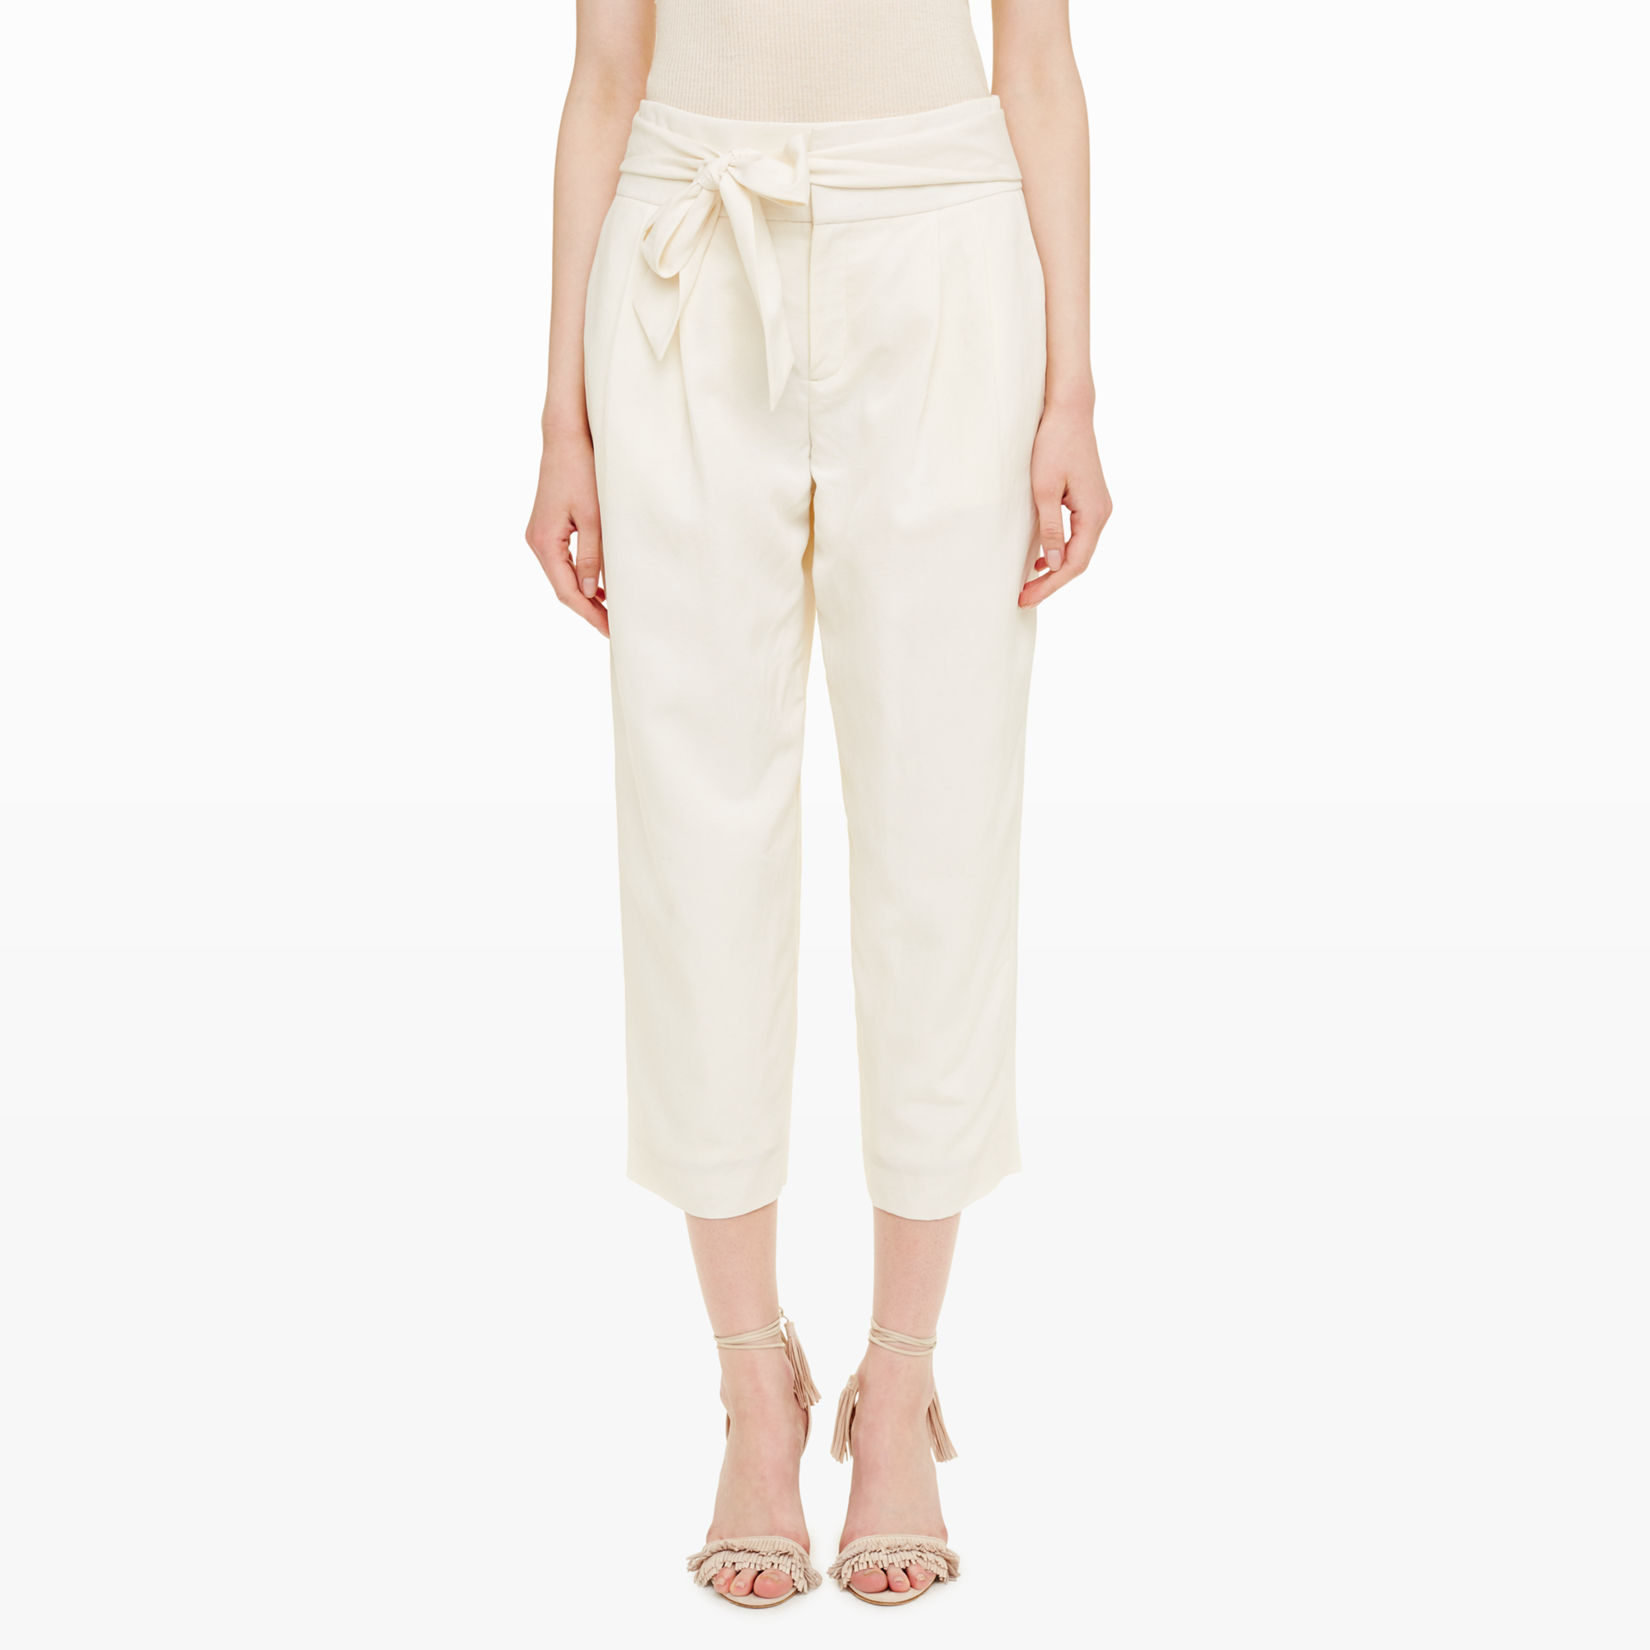 cloe hand bags - Women   Pants and Culottes   Club Monaco